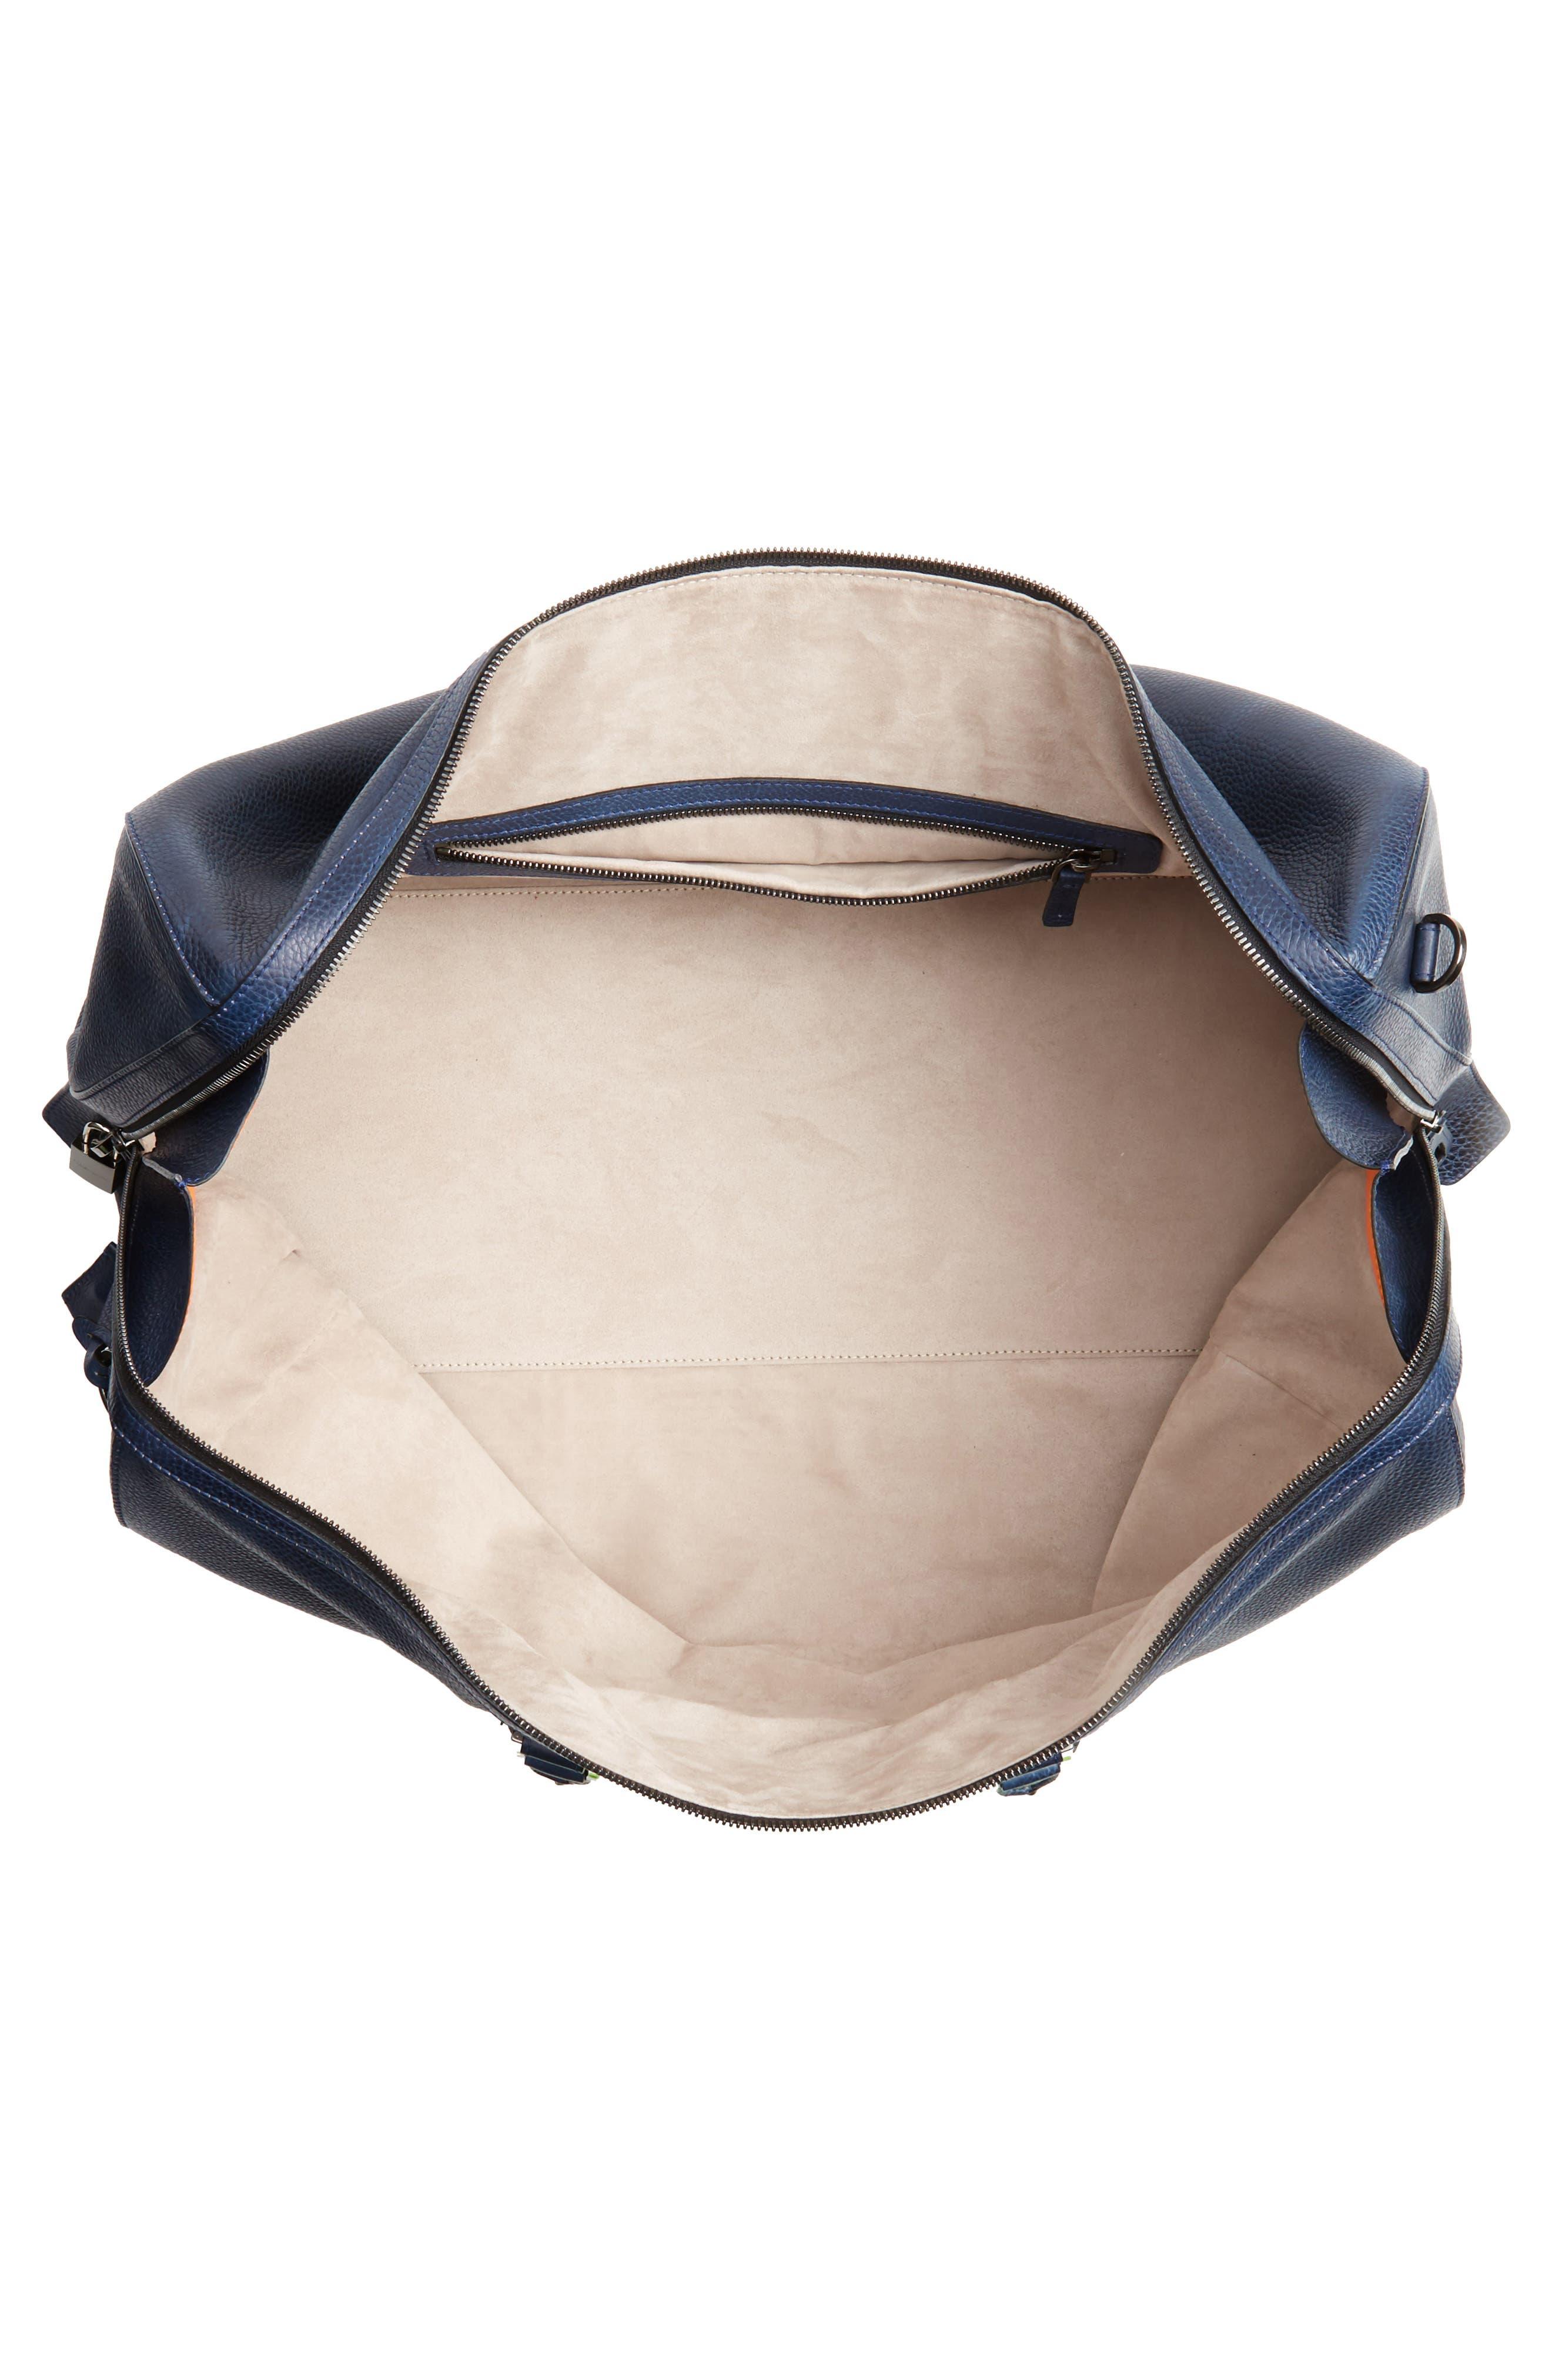 Traveler Leather Duffel Bag,                             Alternate thumbnail 14, color,